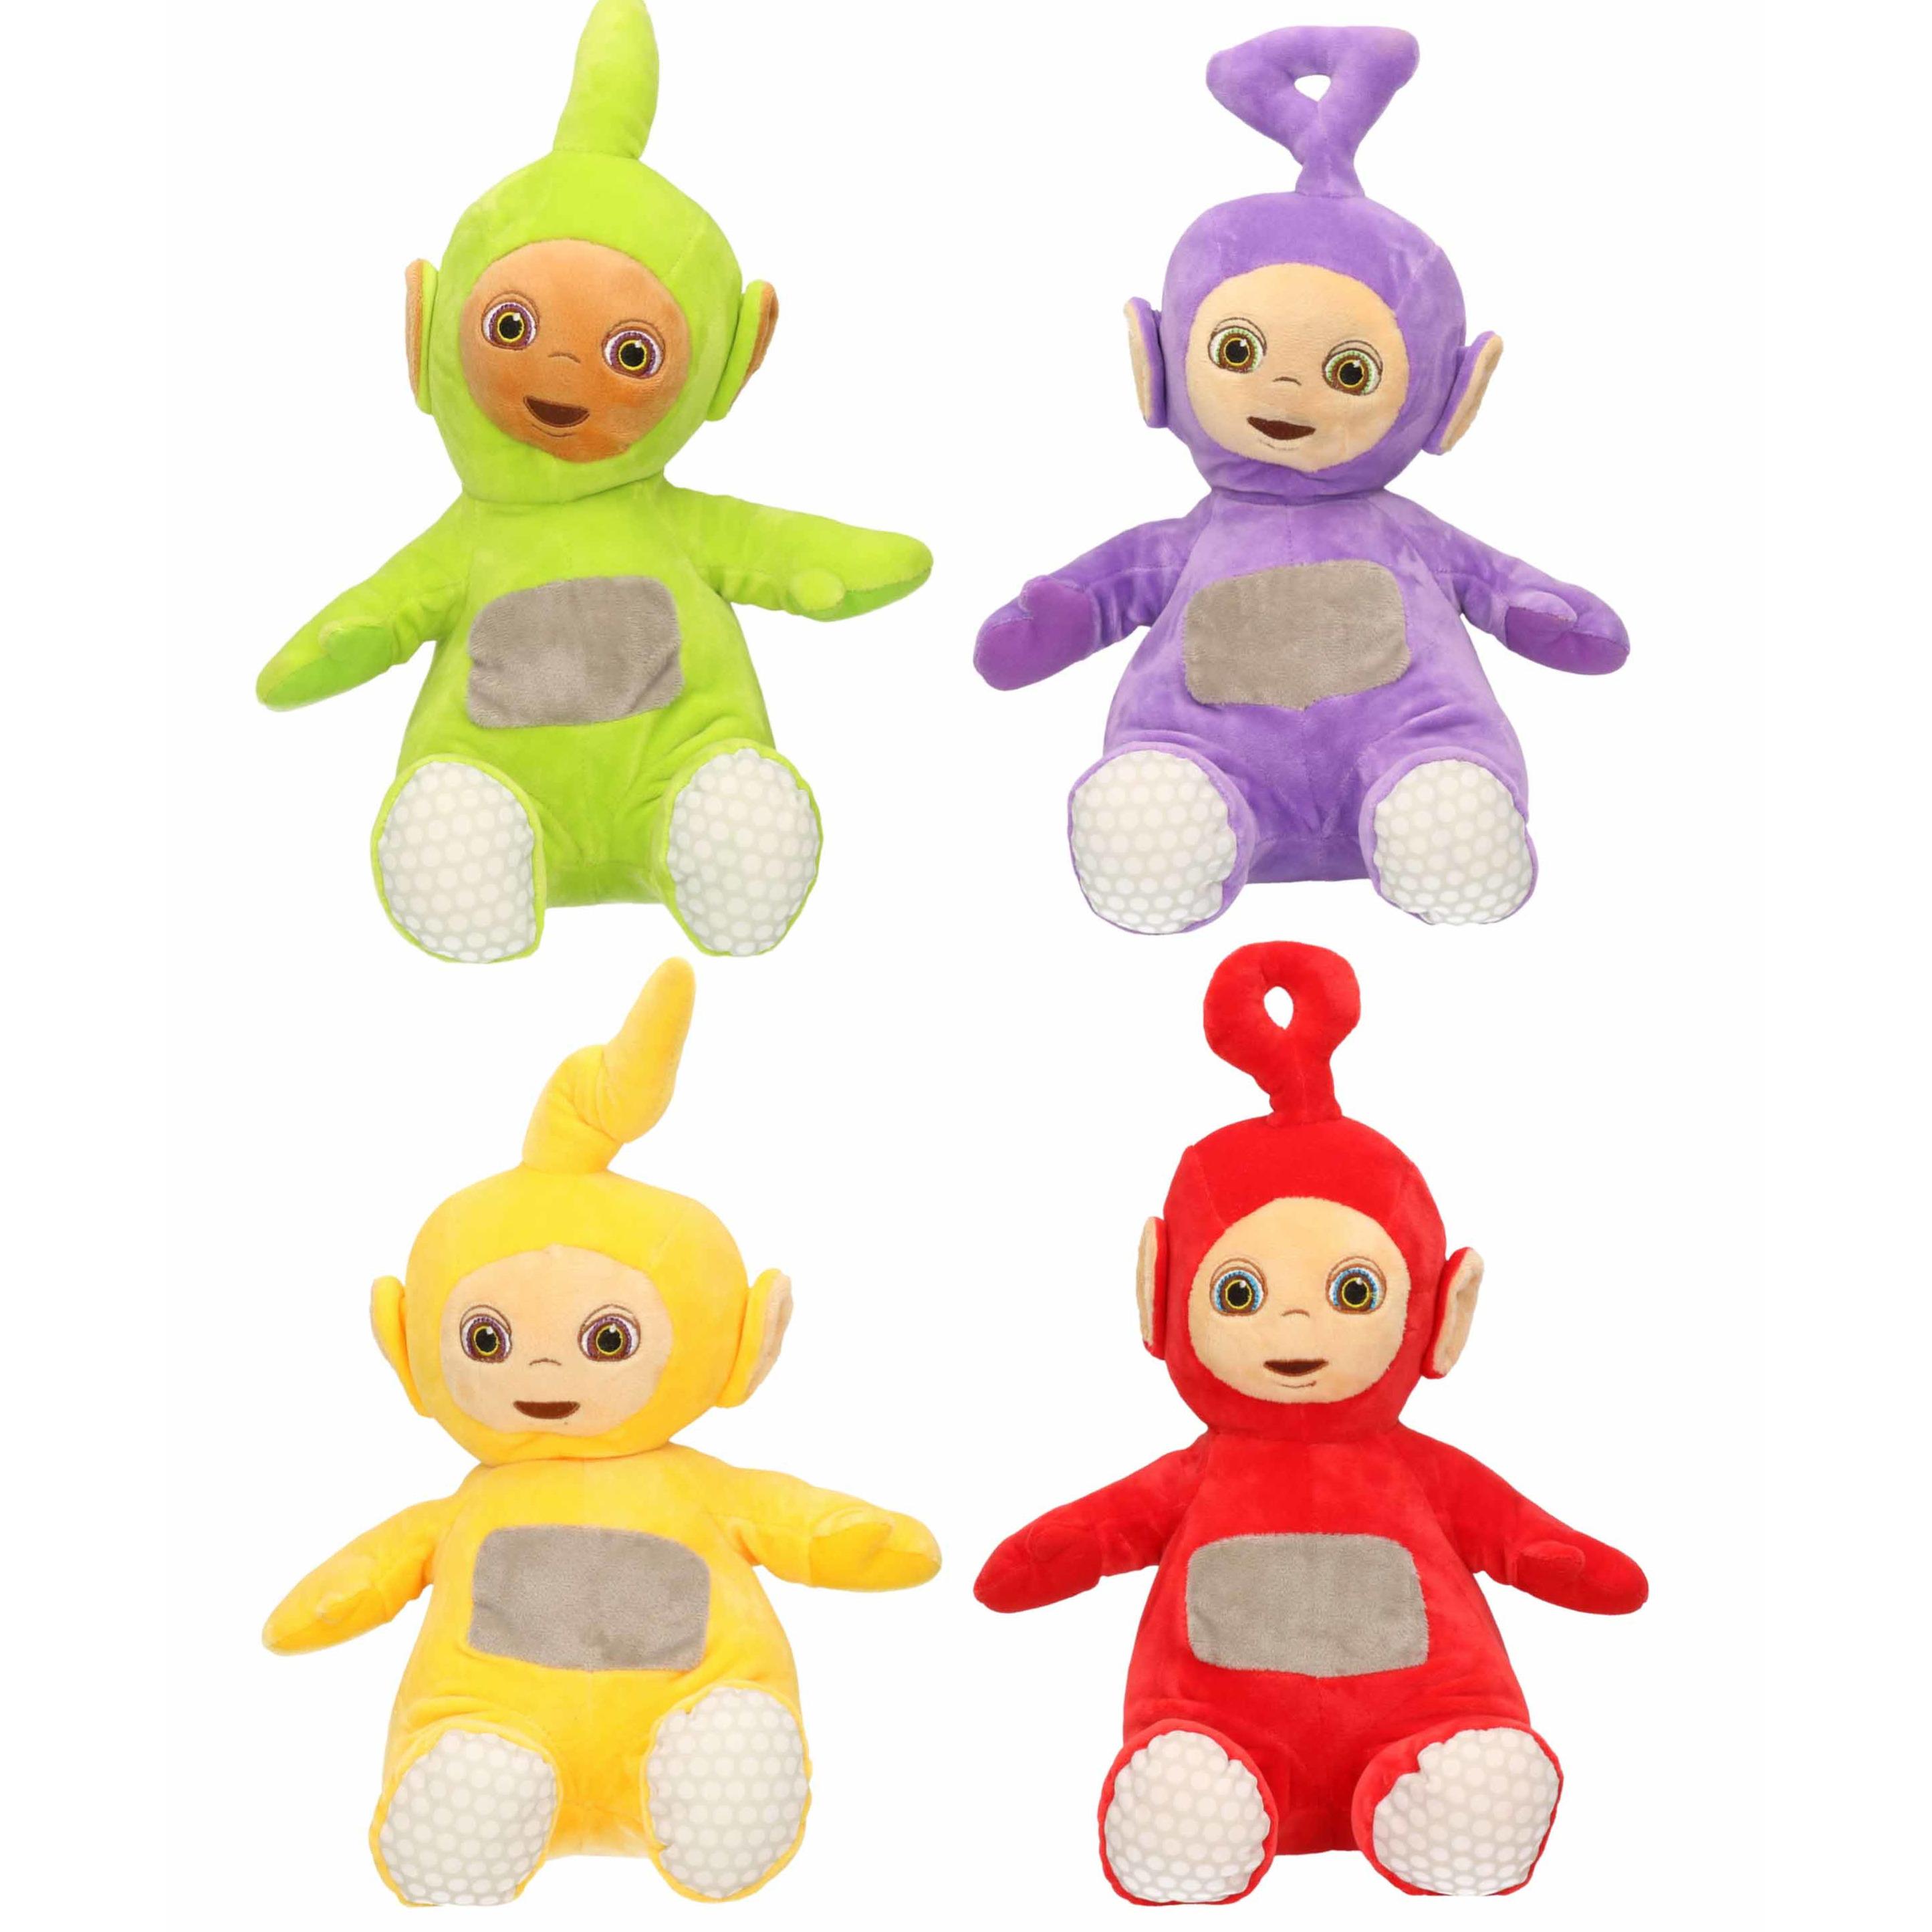 Set van 4x pluche teletubbies speelgoed knuffels tinky winky dipsy laa laa po 34 cm